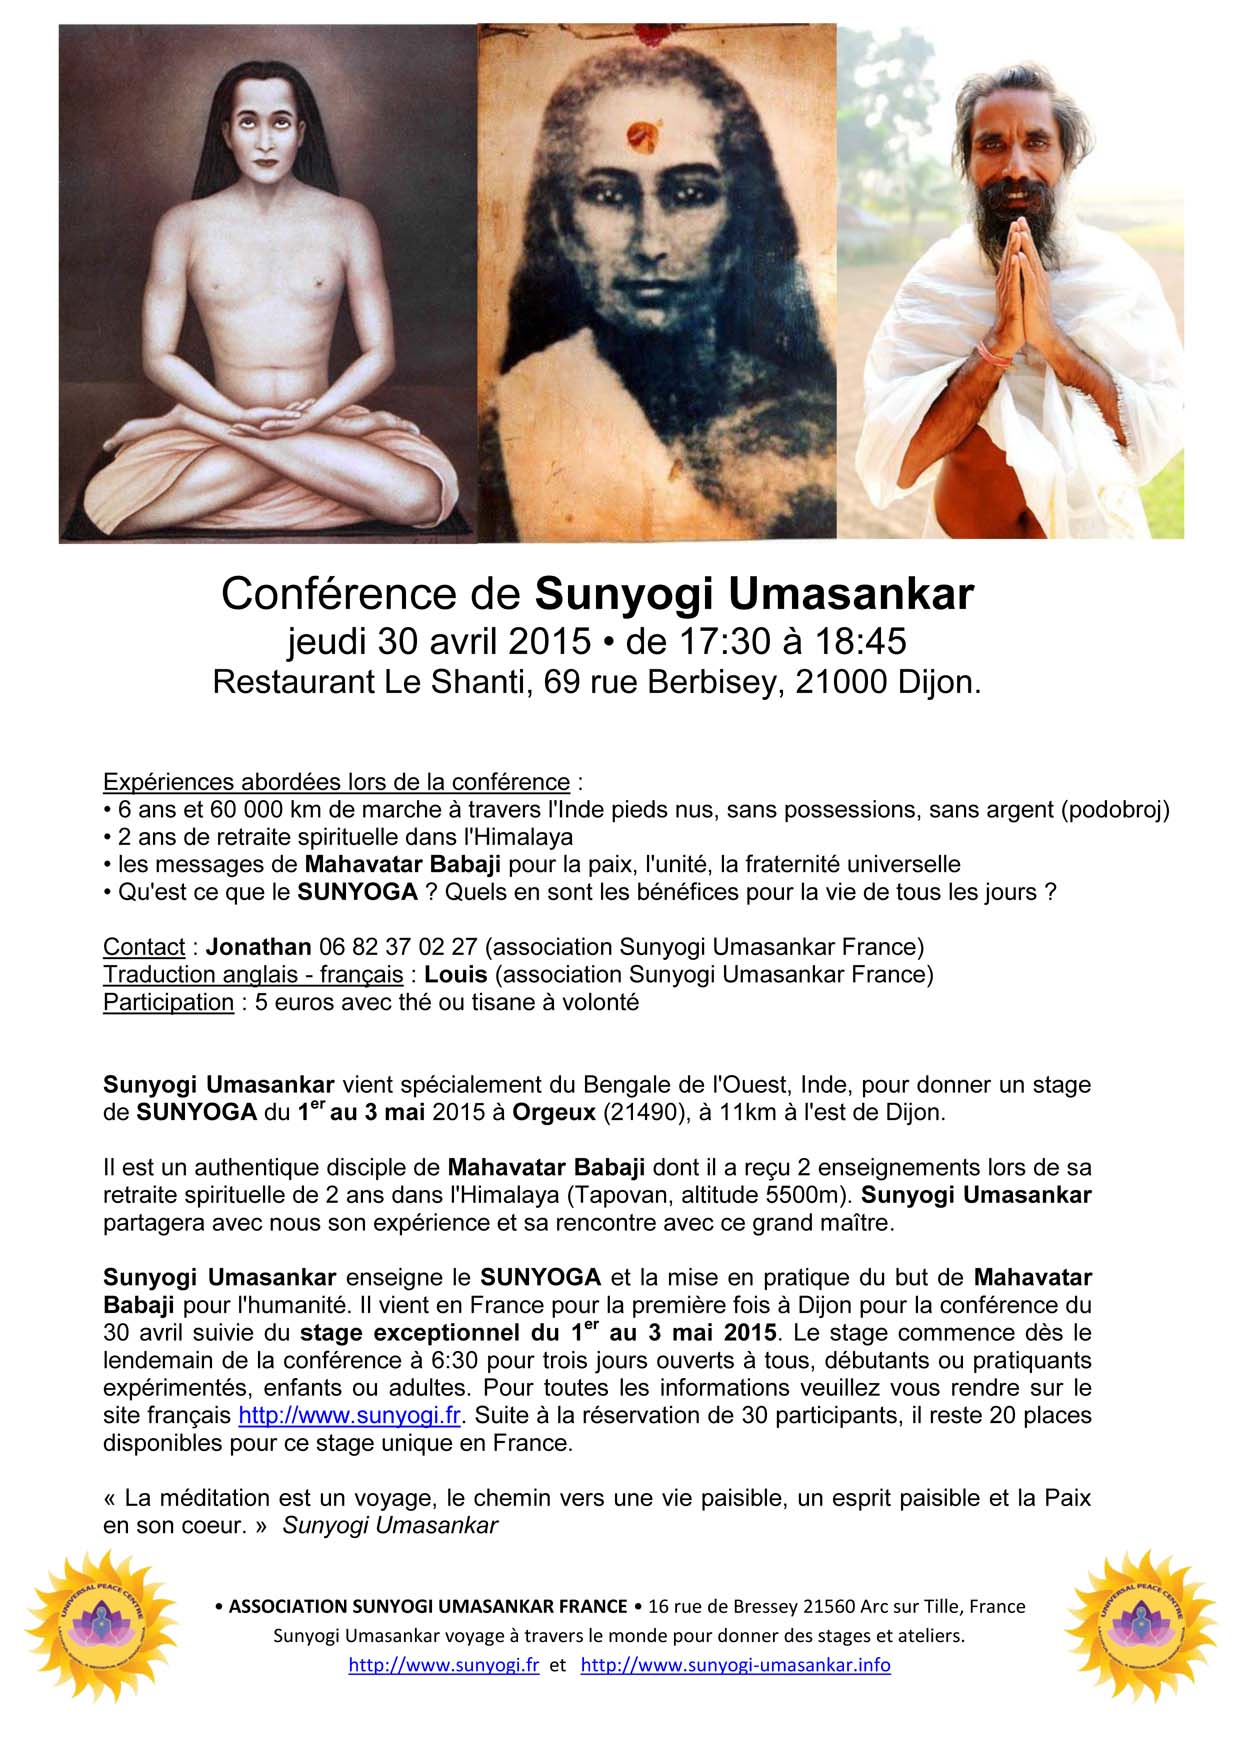 Conférence Sunyogi 30 avril 2015 17h-18h45 au Shanti Dijon-